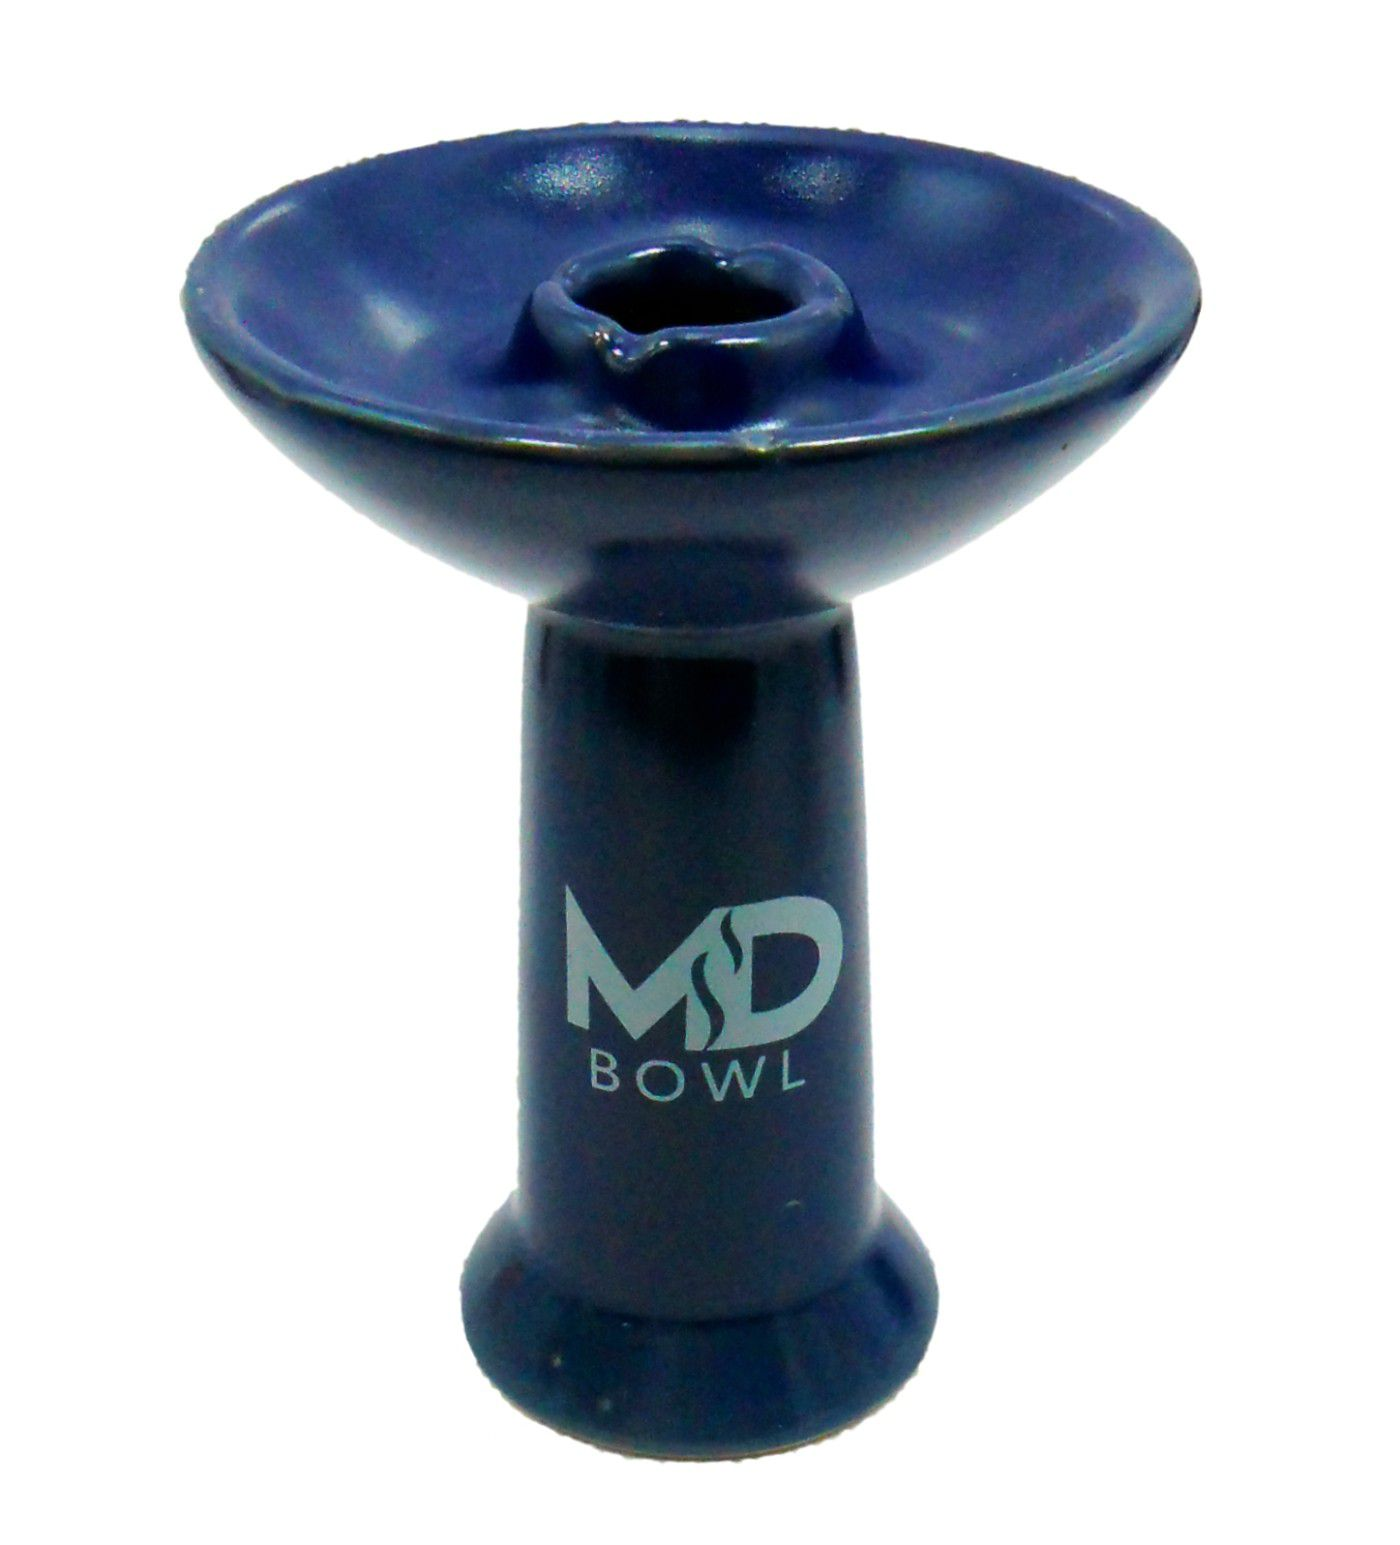 Fornilho/Rosh para narguile MD BOWL tipo funil. Marca MD Hookah. Altura 11cm. Encaixe padrão Kaloud.